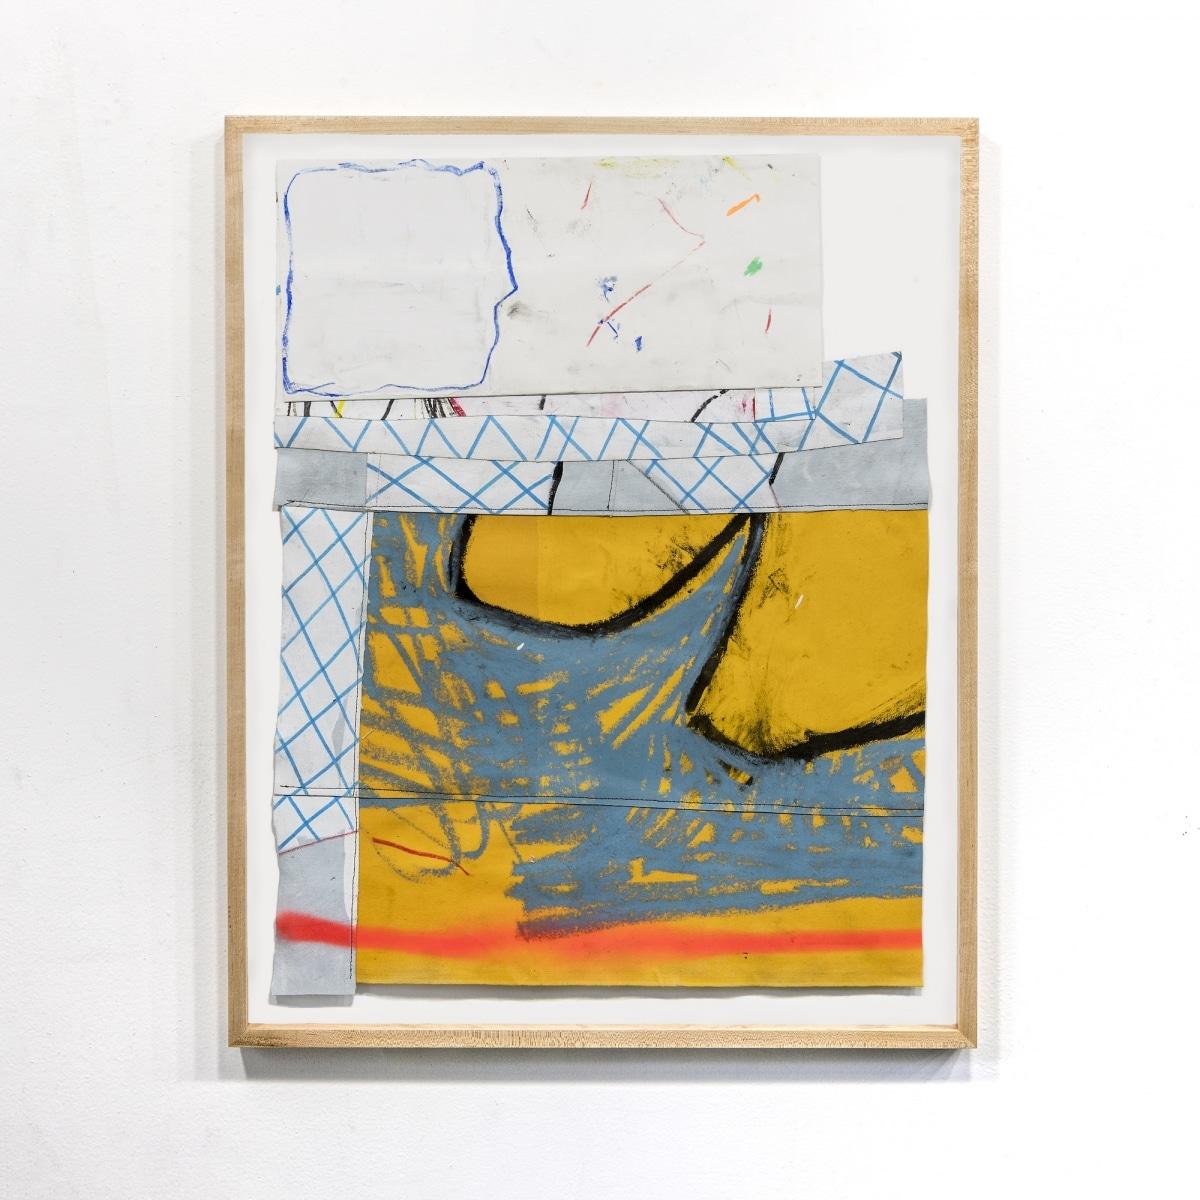 Hot Dog, Bird Sound, Infatuation, 2018, Mixed Media on Canvas, 76 x 61 cm